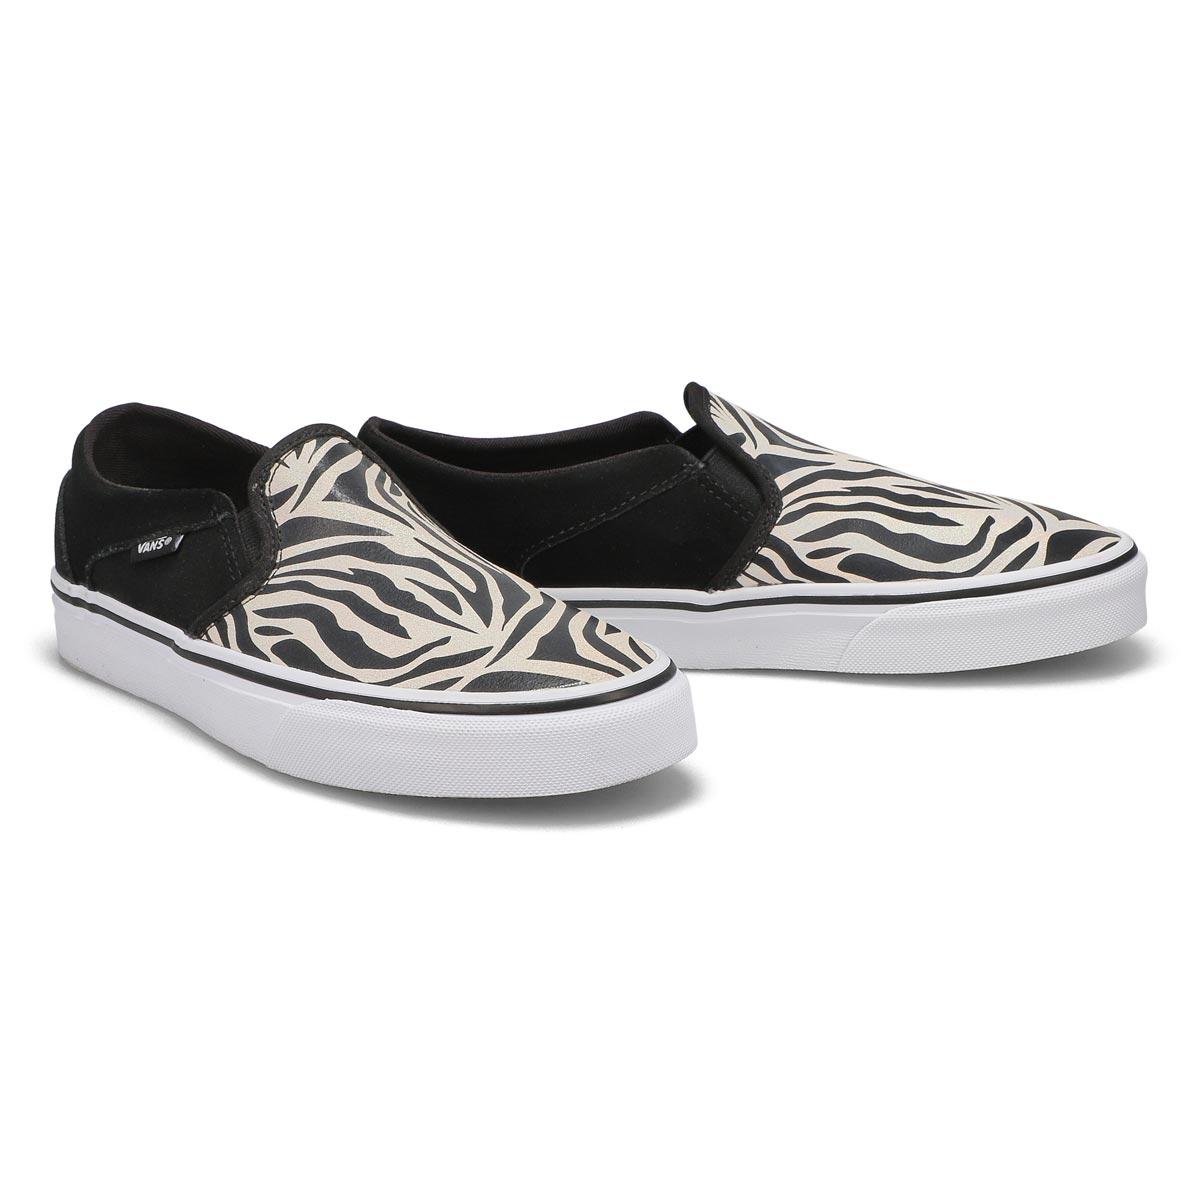 Women's Asher Sneaker - Metallic Zebra/Blk/White